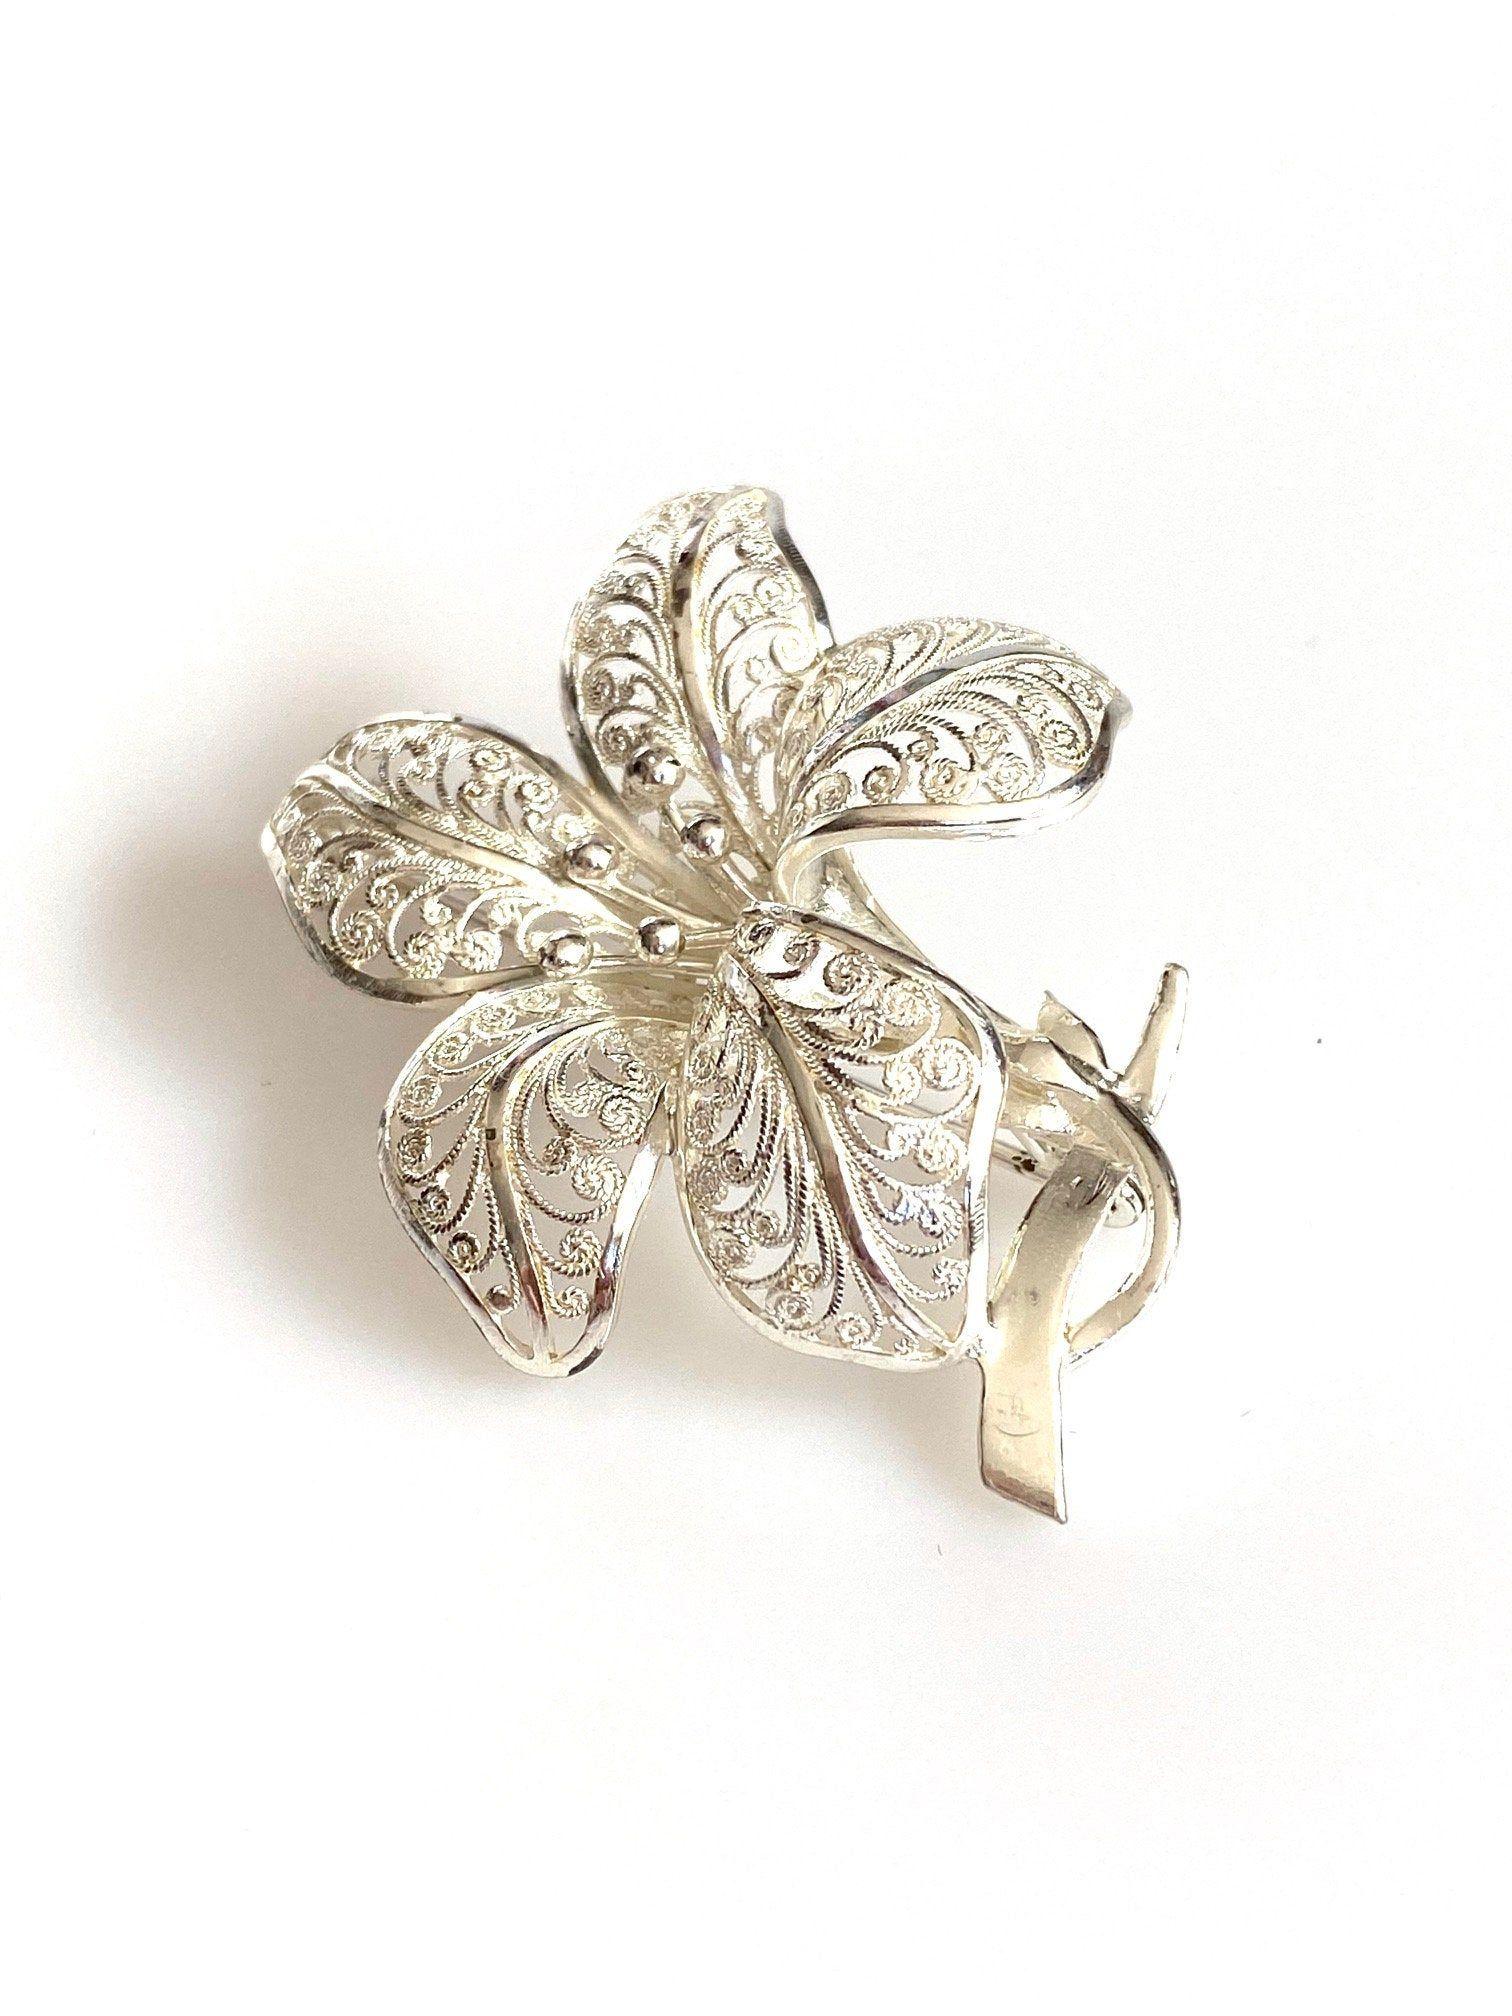 Vintage Silver 835 Brooch Pin